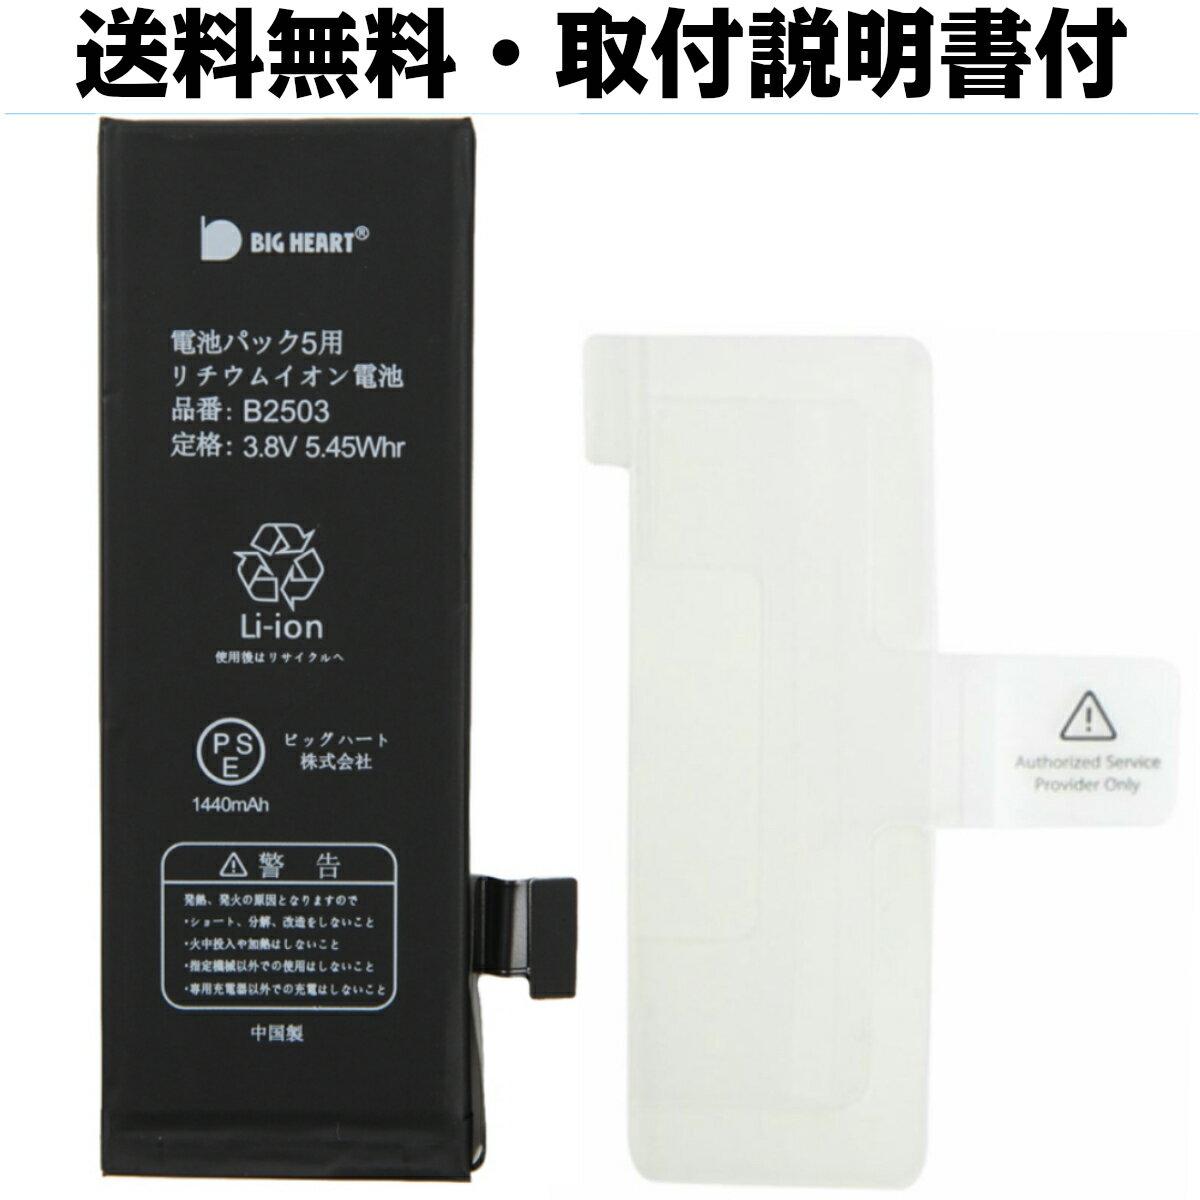 (YP)B25-103 【互換品】【送料無料】iPhone5 高品質 専用互換バッテリー 固定用両面テープ付 交換用 全充電方法対応 P23Jan16